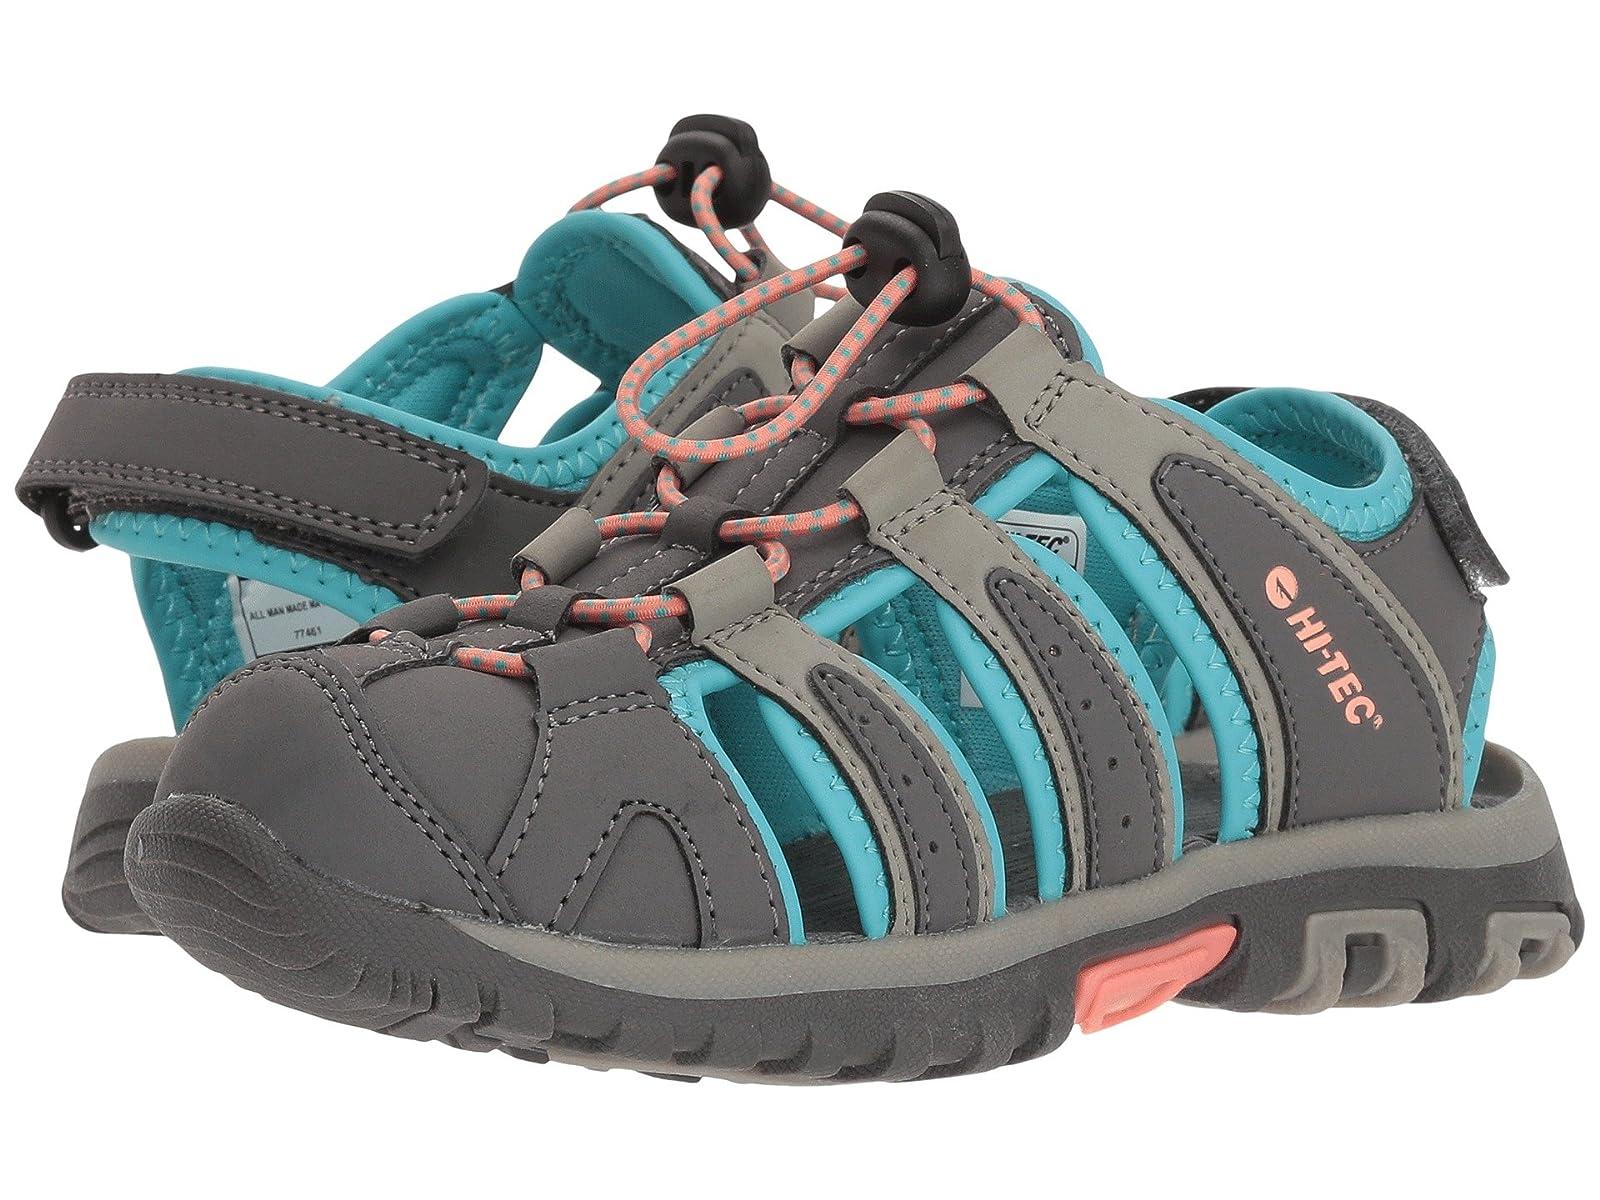 Hi-Tec Kids Cove II (Toddler/Little Kid/Big Kid)Atmospheric grades have affordable shoes